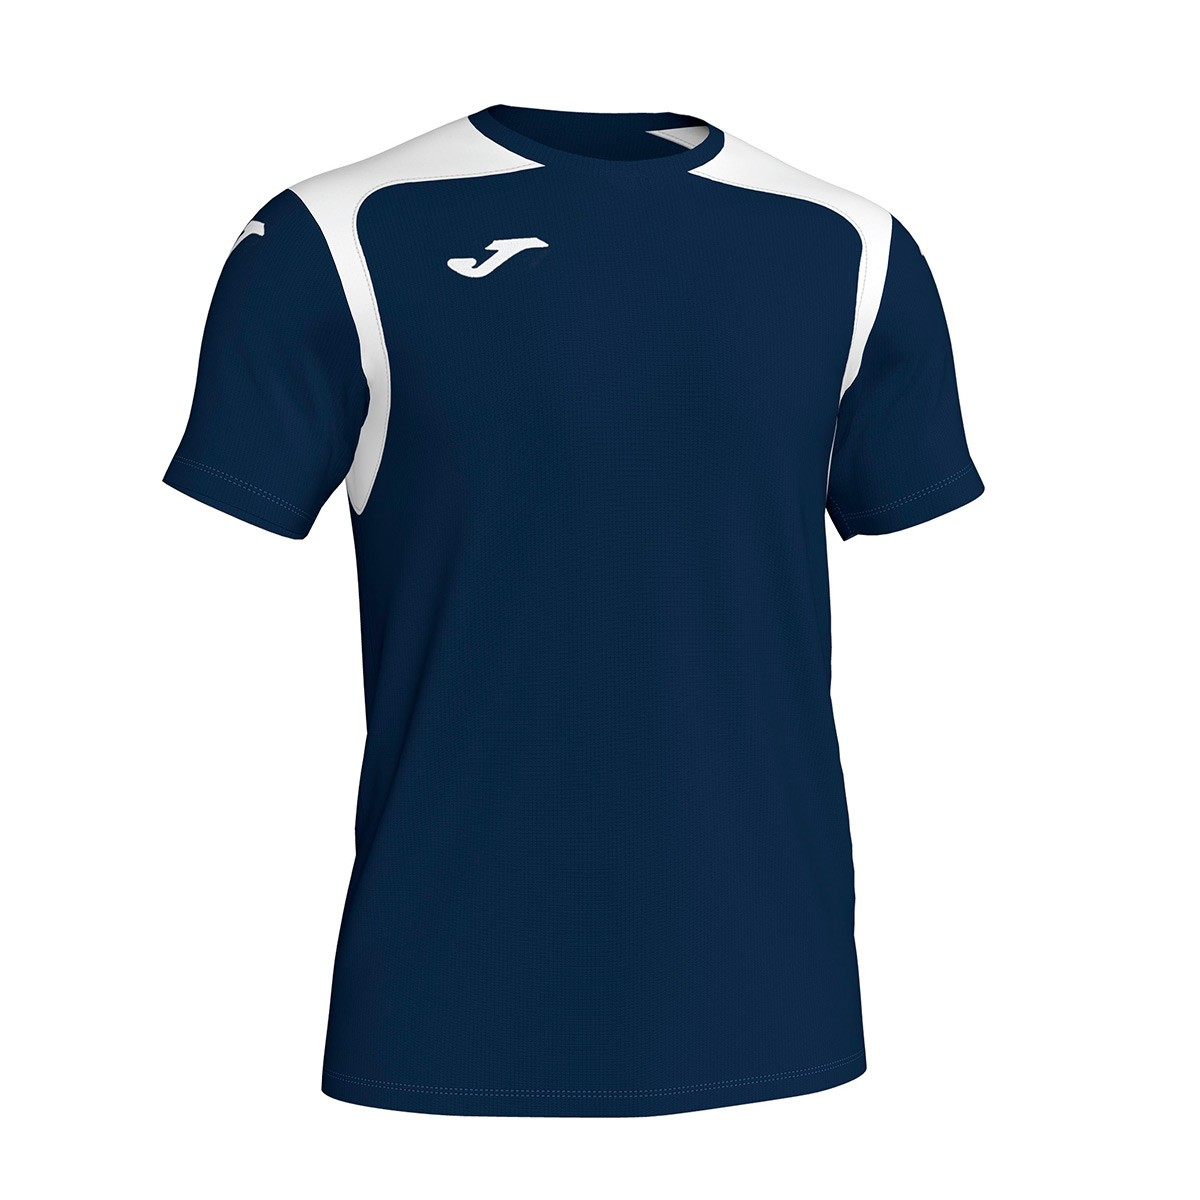 7f679792e Jersey Joma Champion V m/c Navy blue-White - Football store Fútbol ...